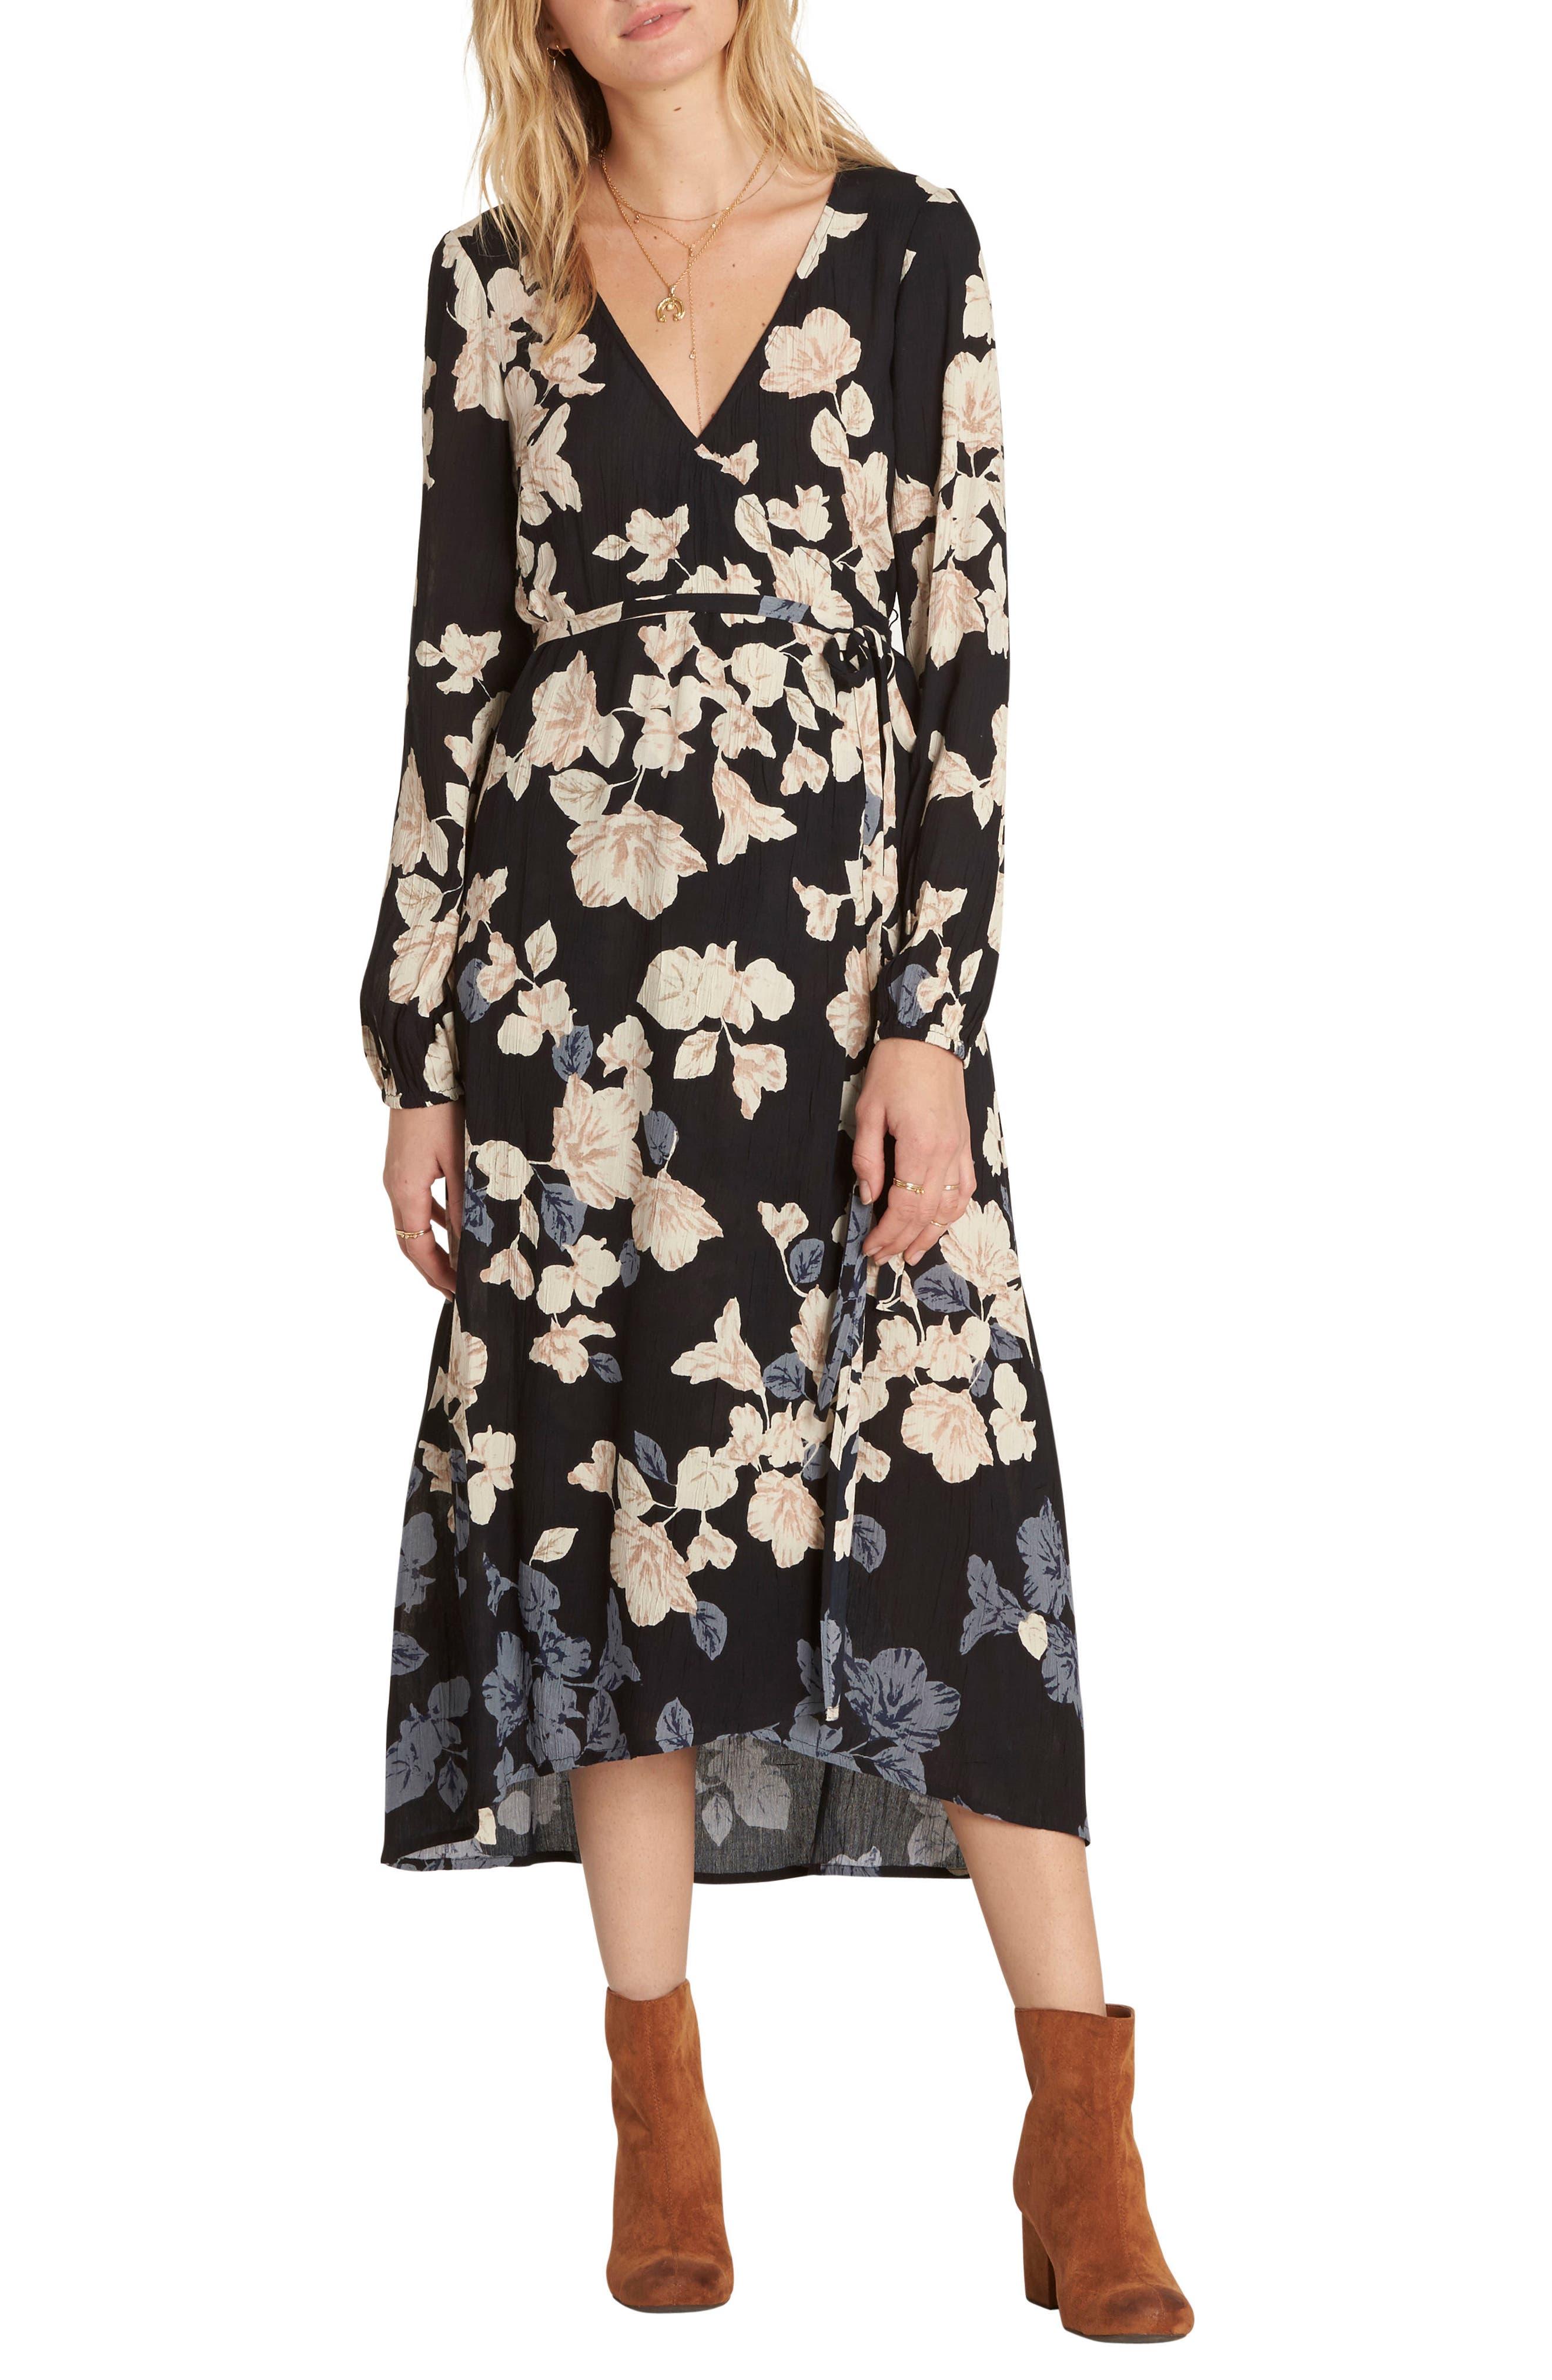 Floral Fever Midi Dress,                         Main,                         color, 001